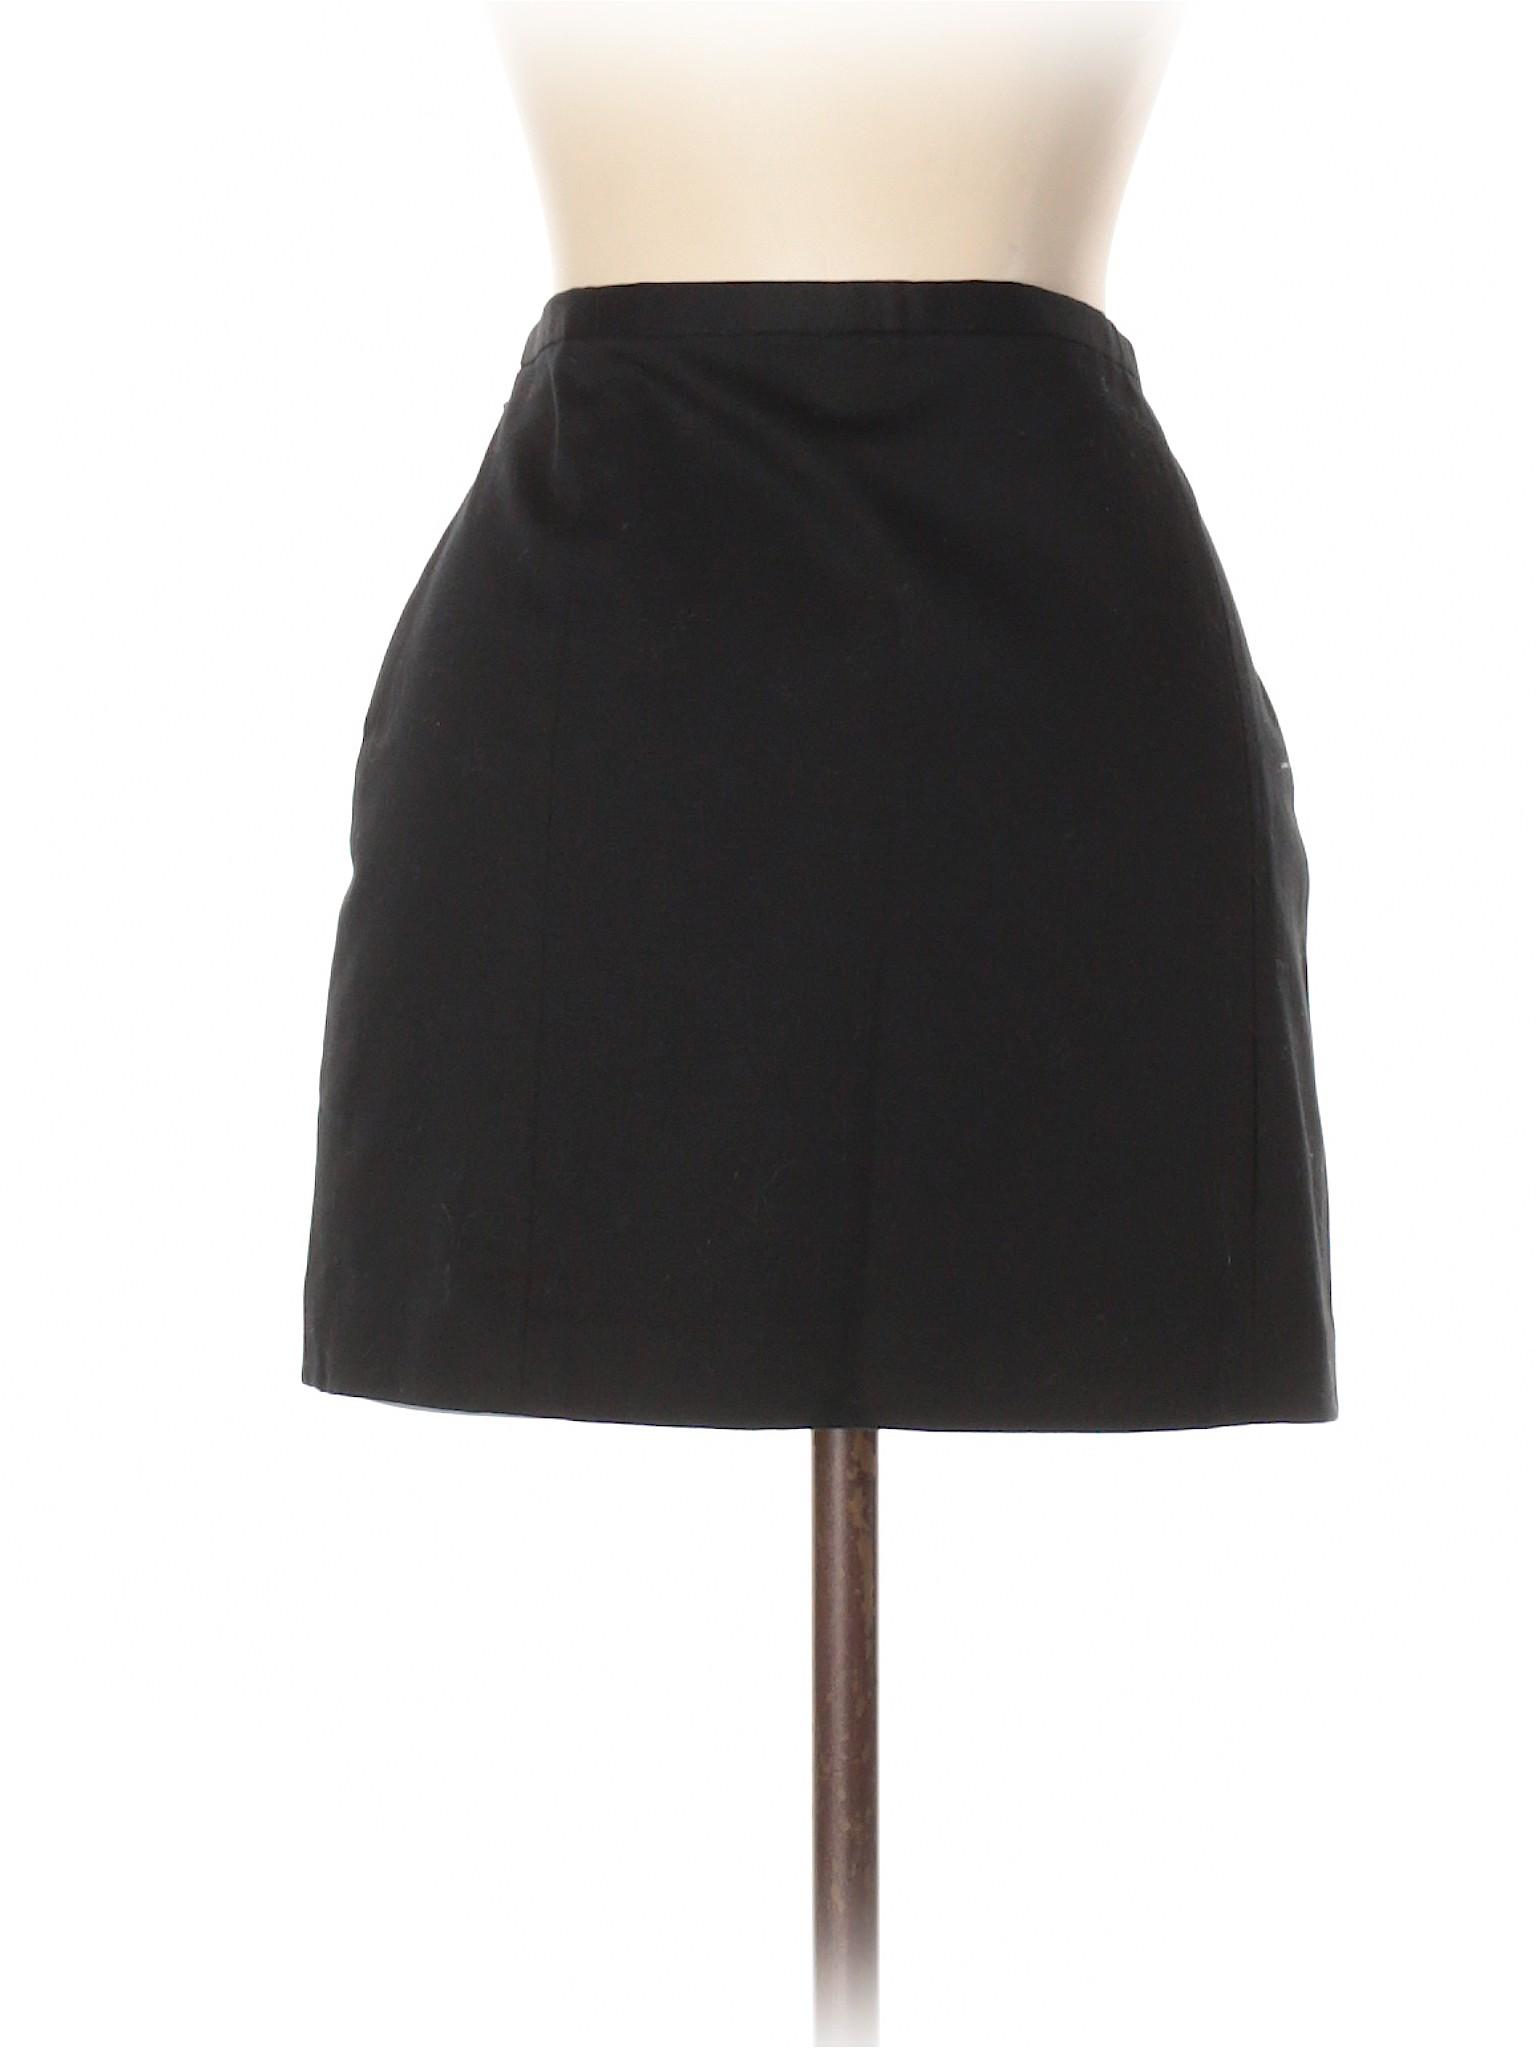 Formal Mason Formal Boutique Mason Mason Skirt Boutique Skirt Boutique IqwIxC0p